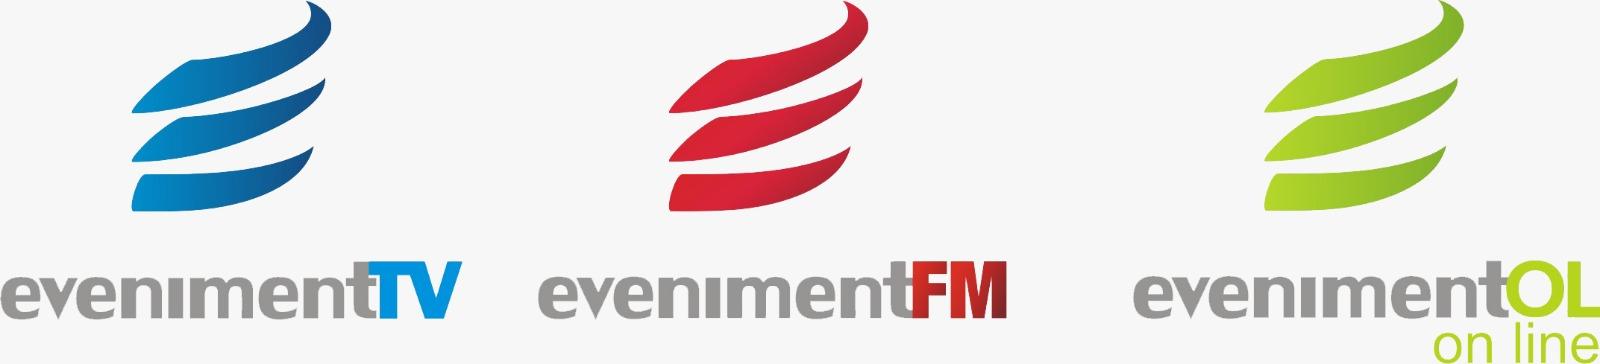 Eveniment FM